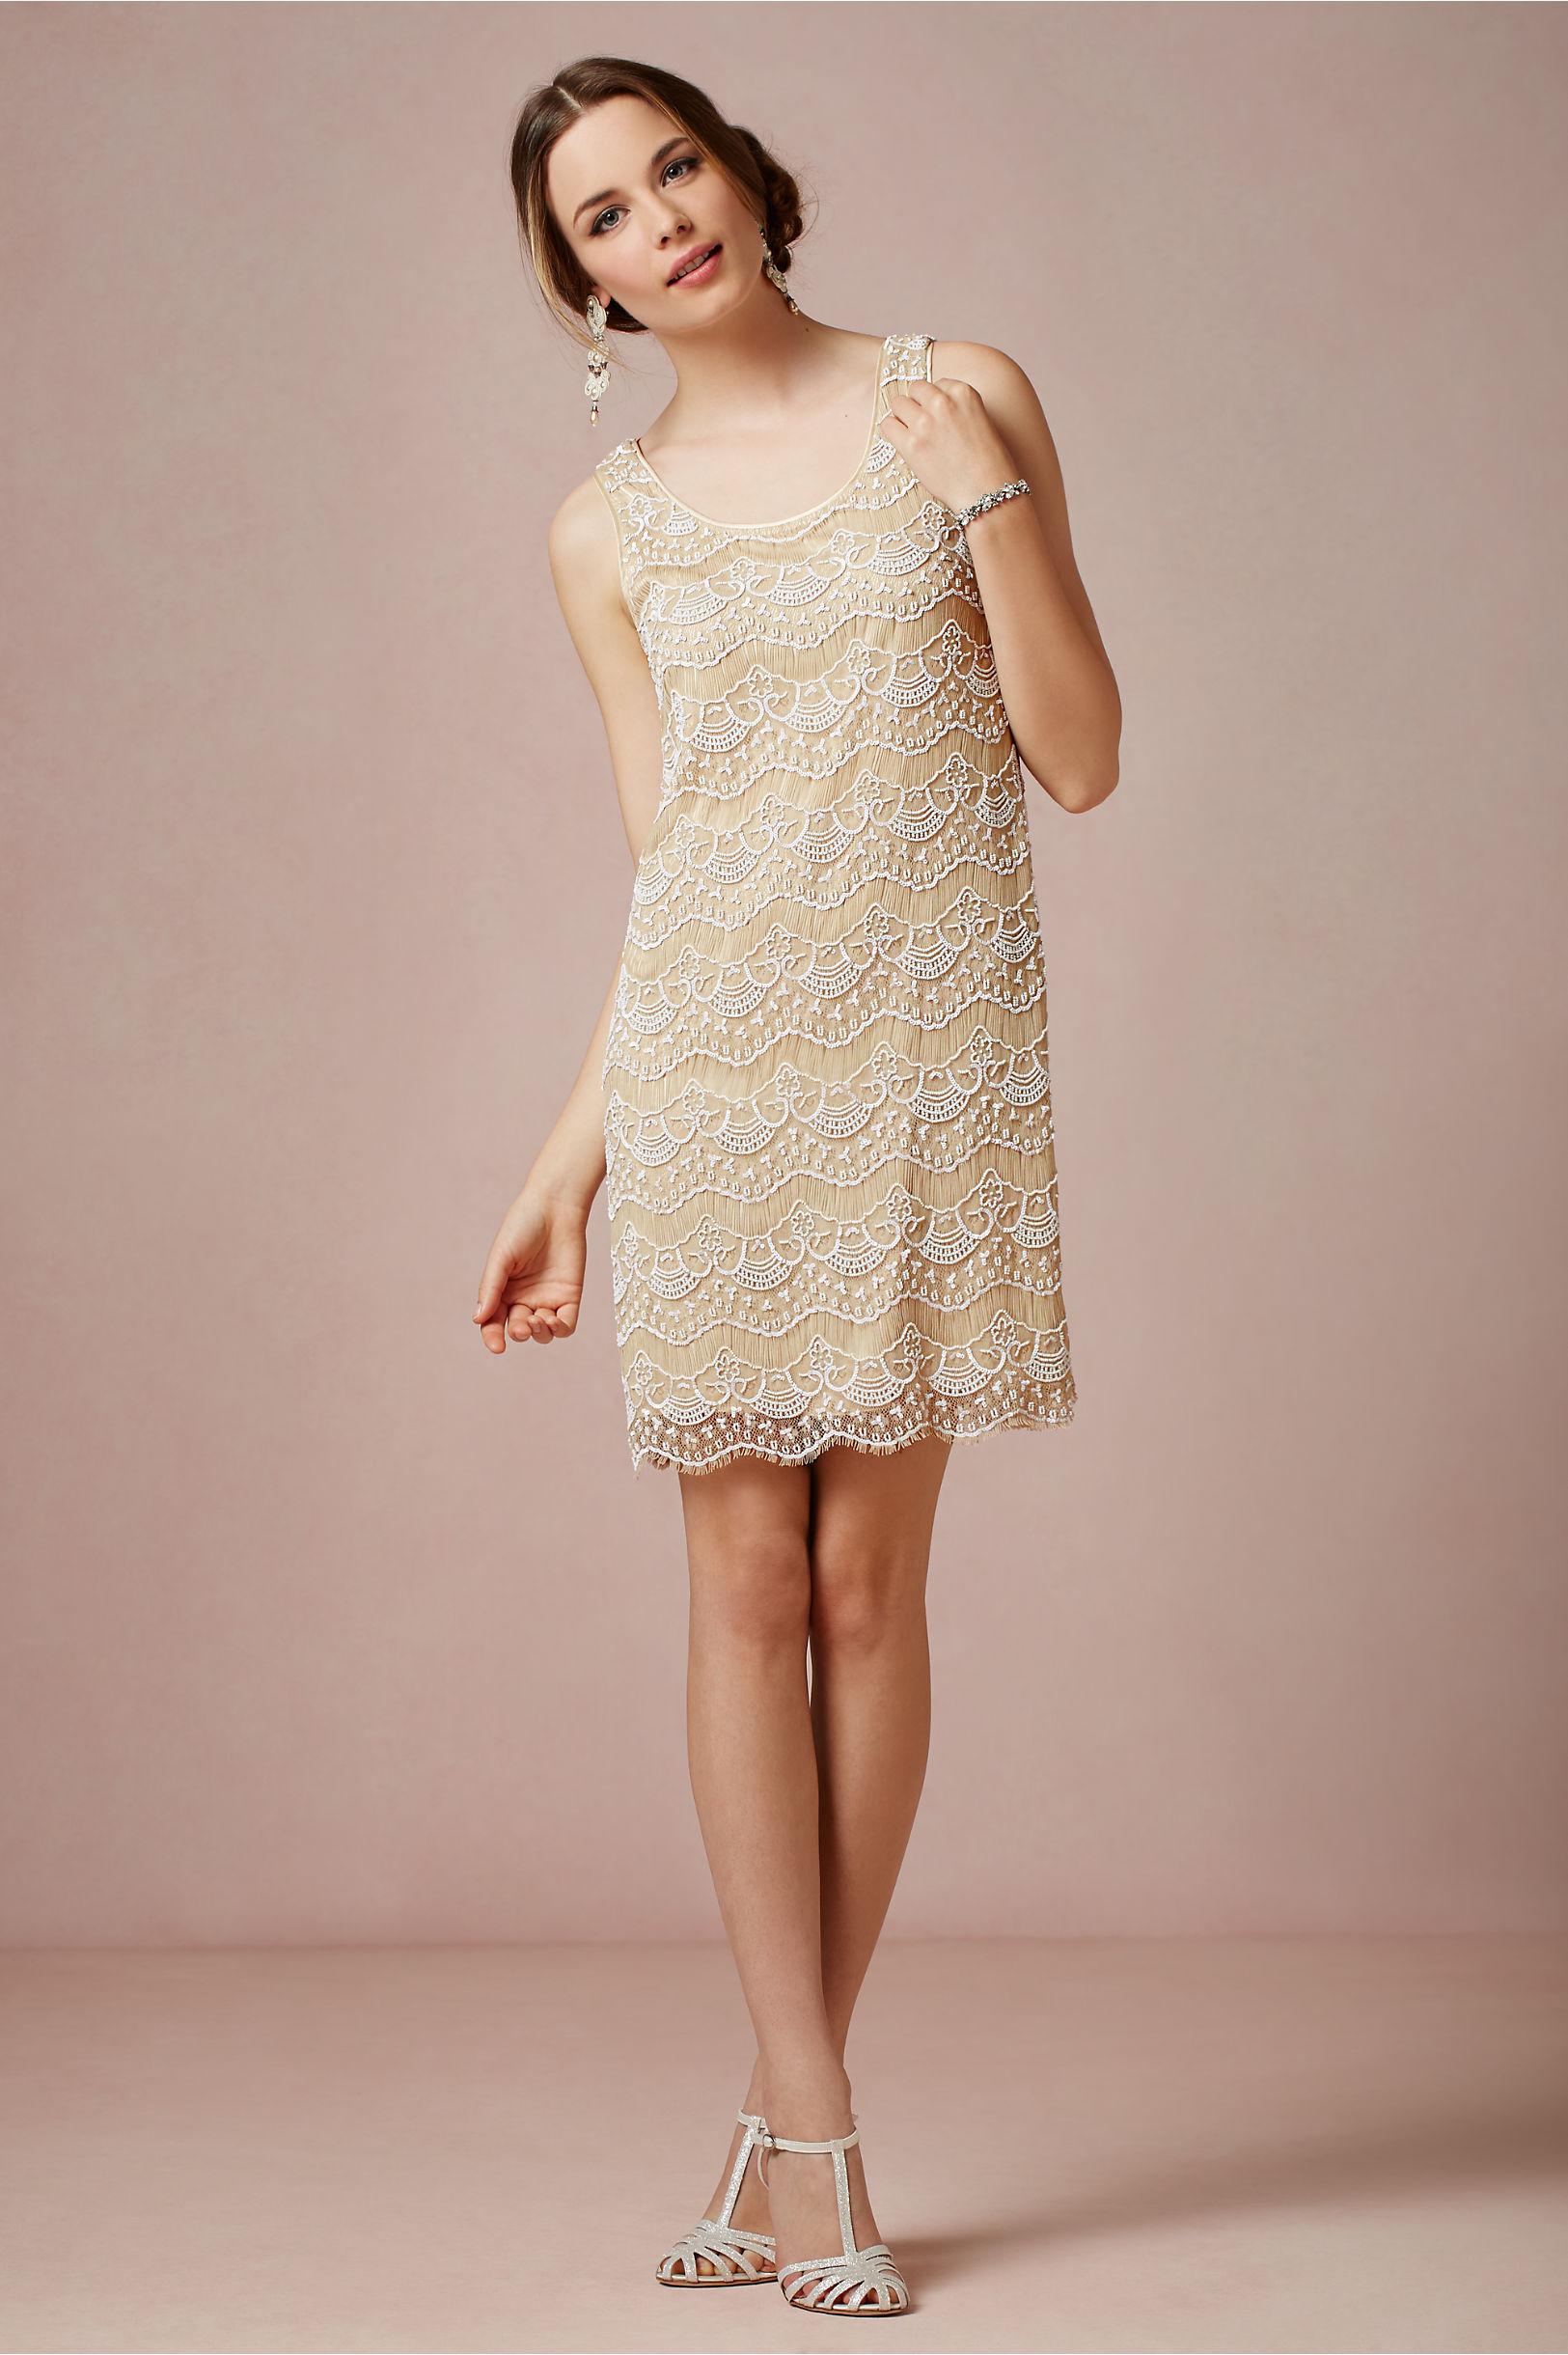 Shift Dress For Wedding | Weddings Dresses